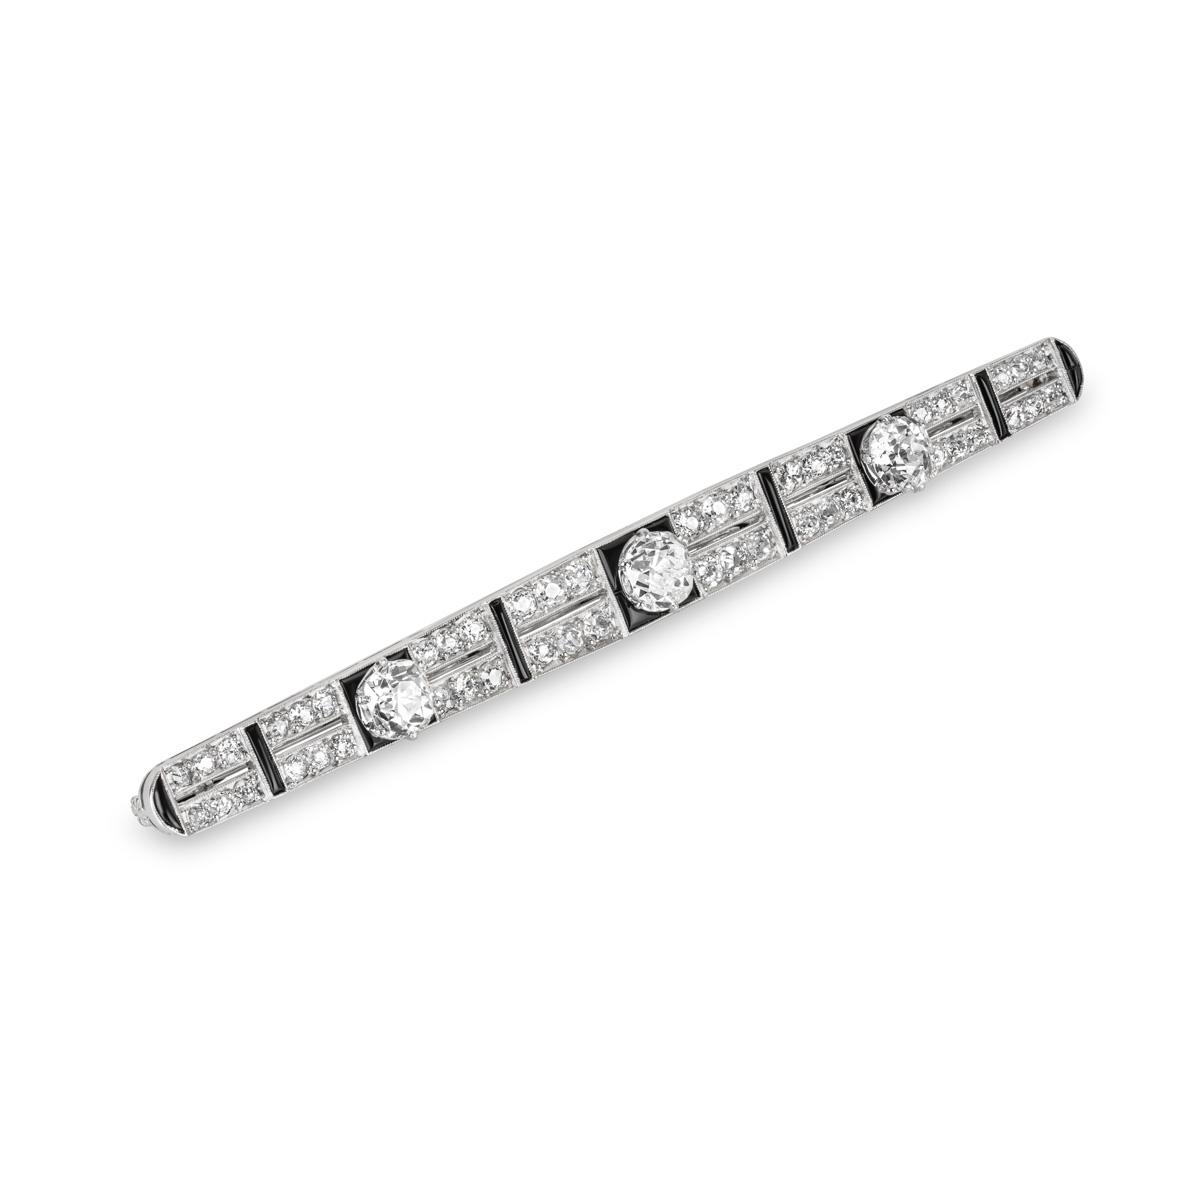 Diamond and Onyx Bar Brooch in Platinum c.1920